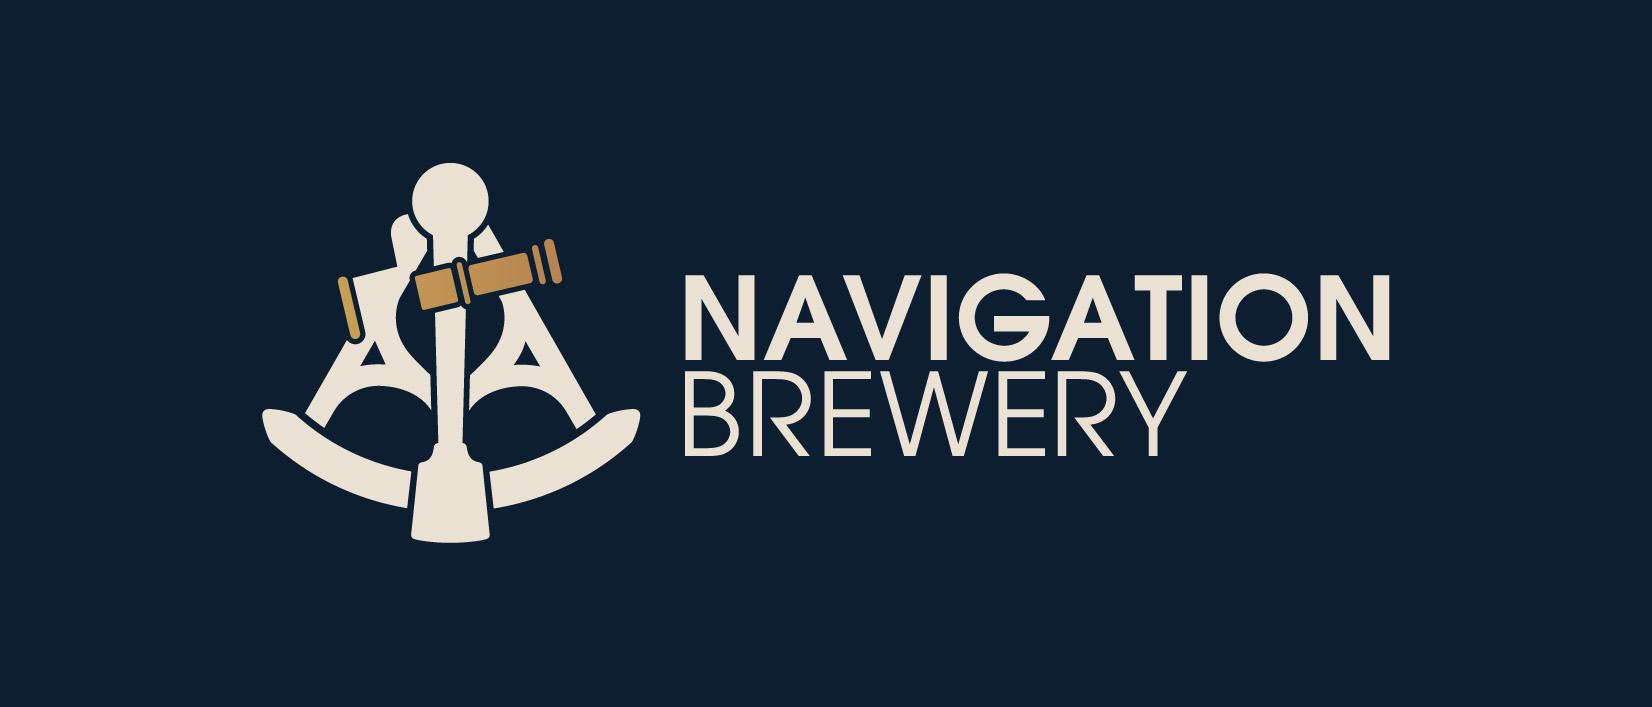 NAV-BREW-BLUE_BACKGROUND